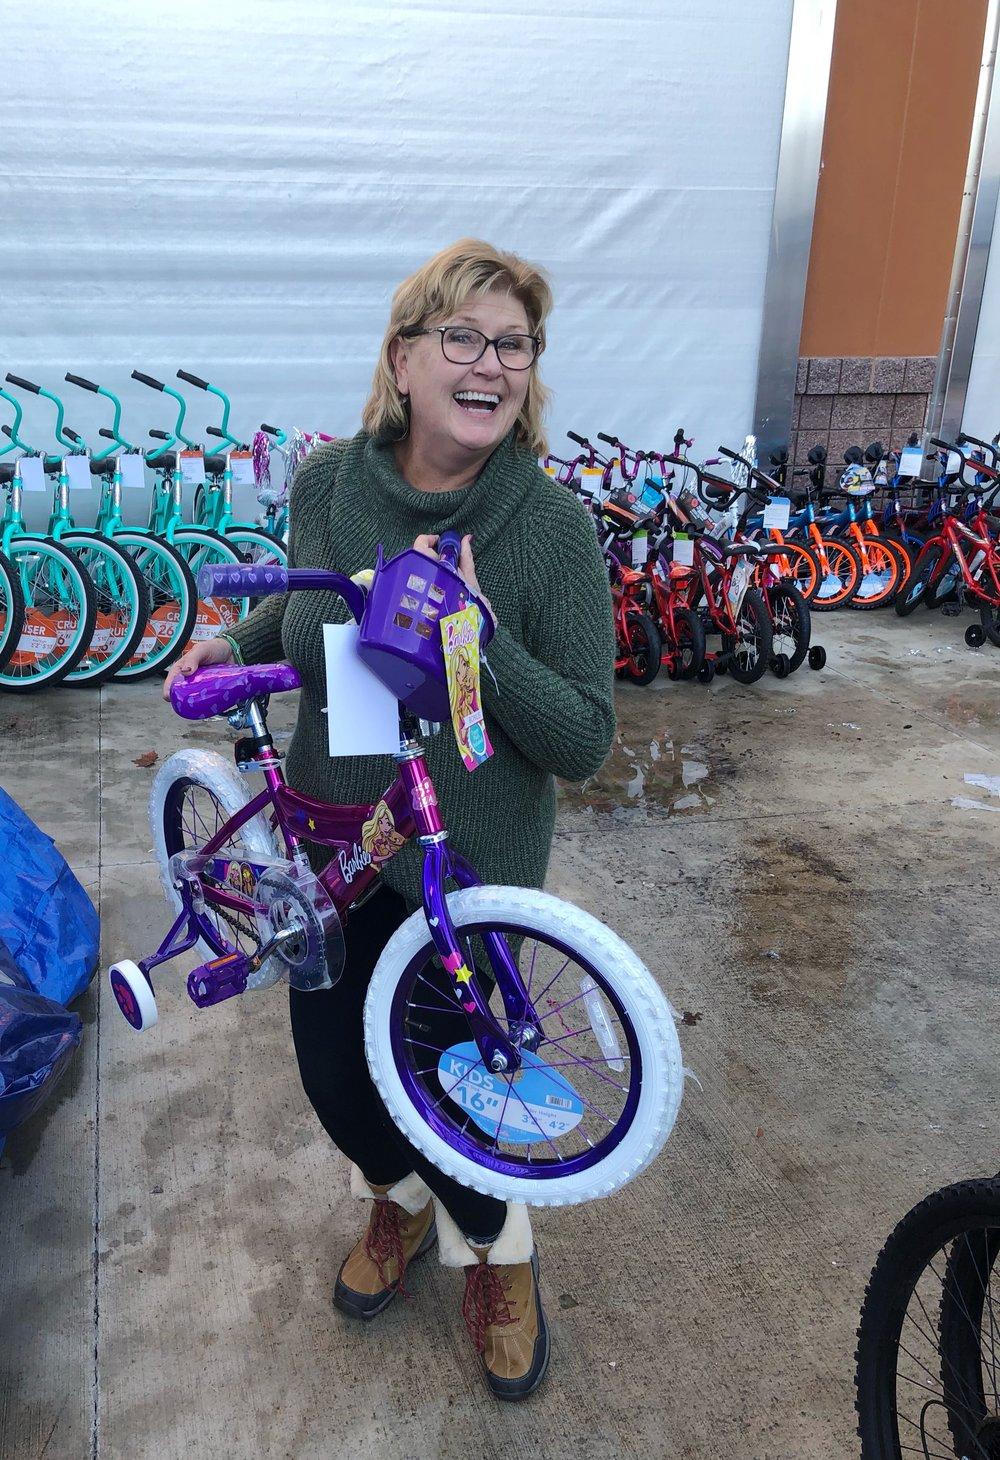 Sue Camper, Rotary member, loading a little girl's bike